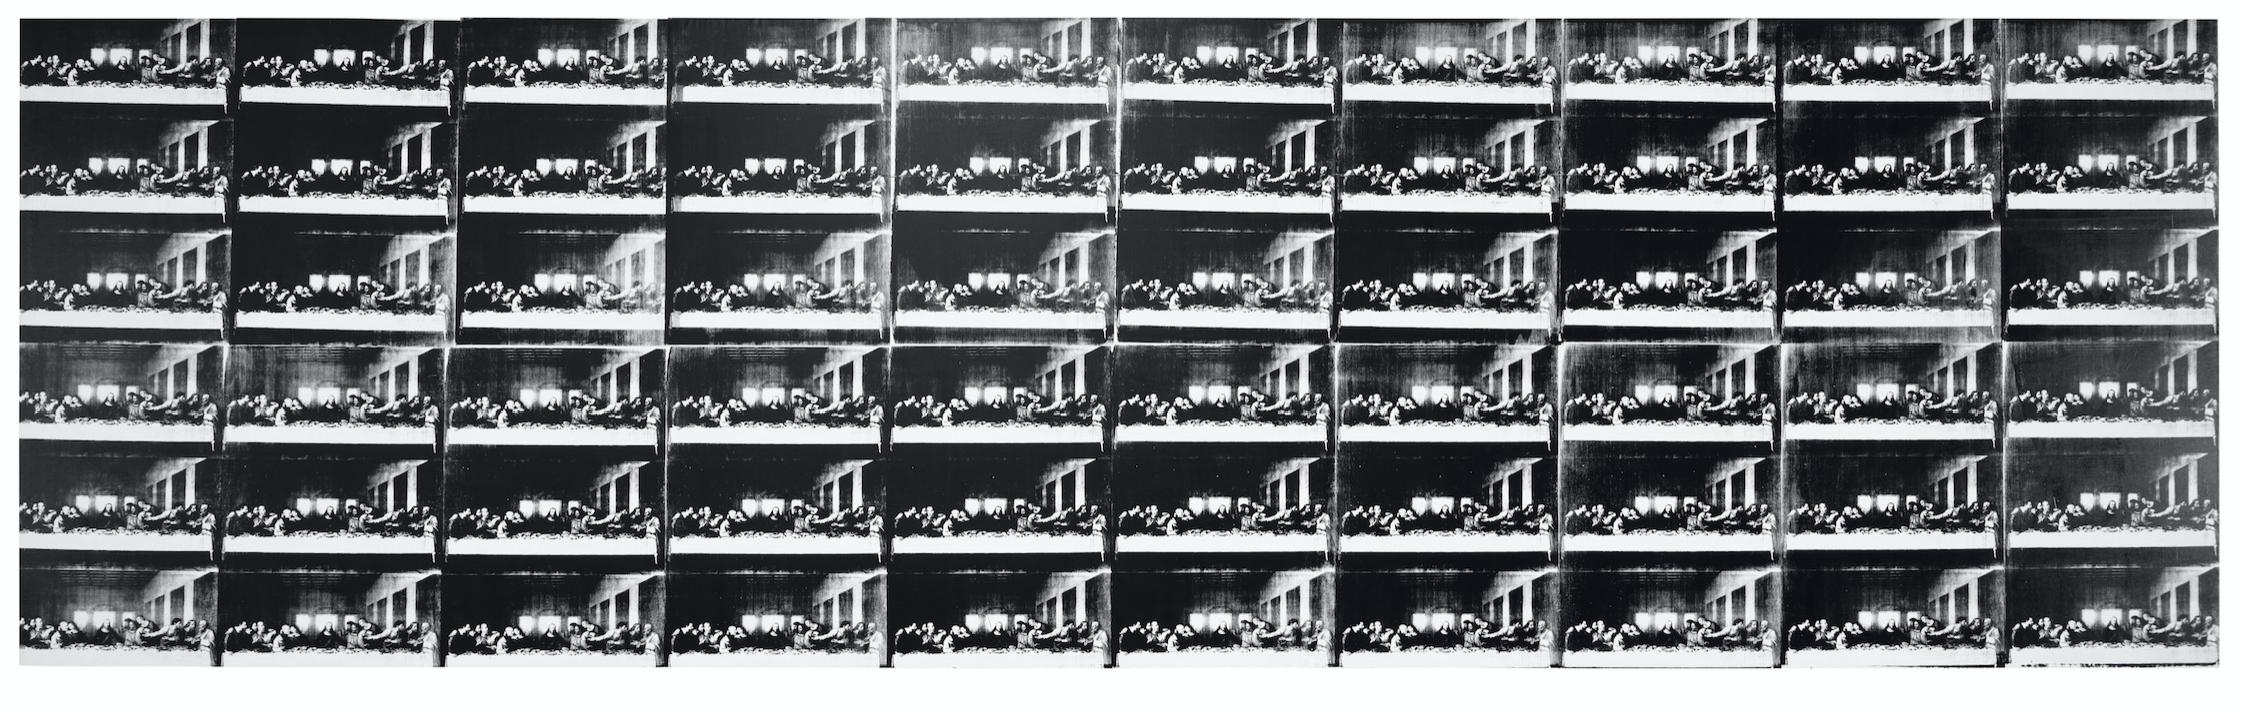 Andy Warhol Sixty Last Supper, Museo del Novecento, Milano